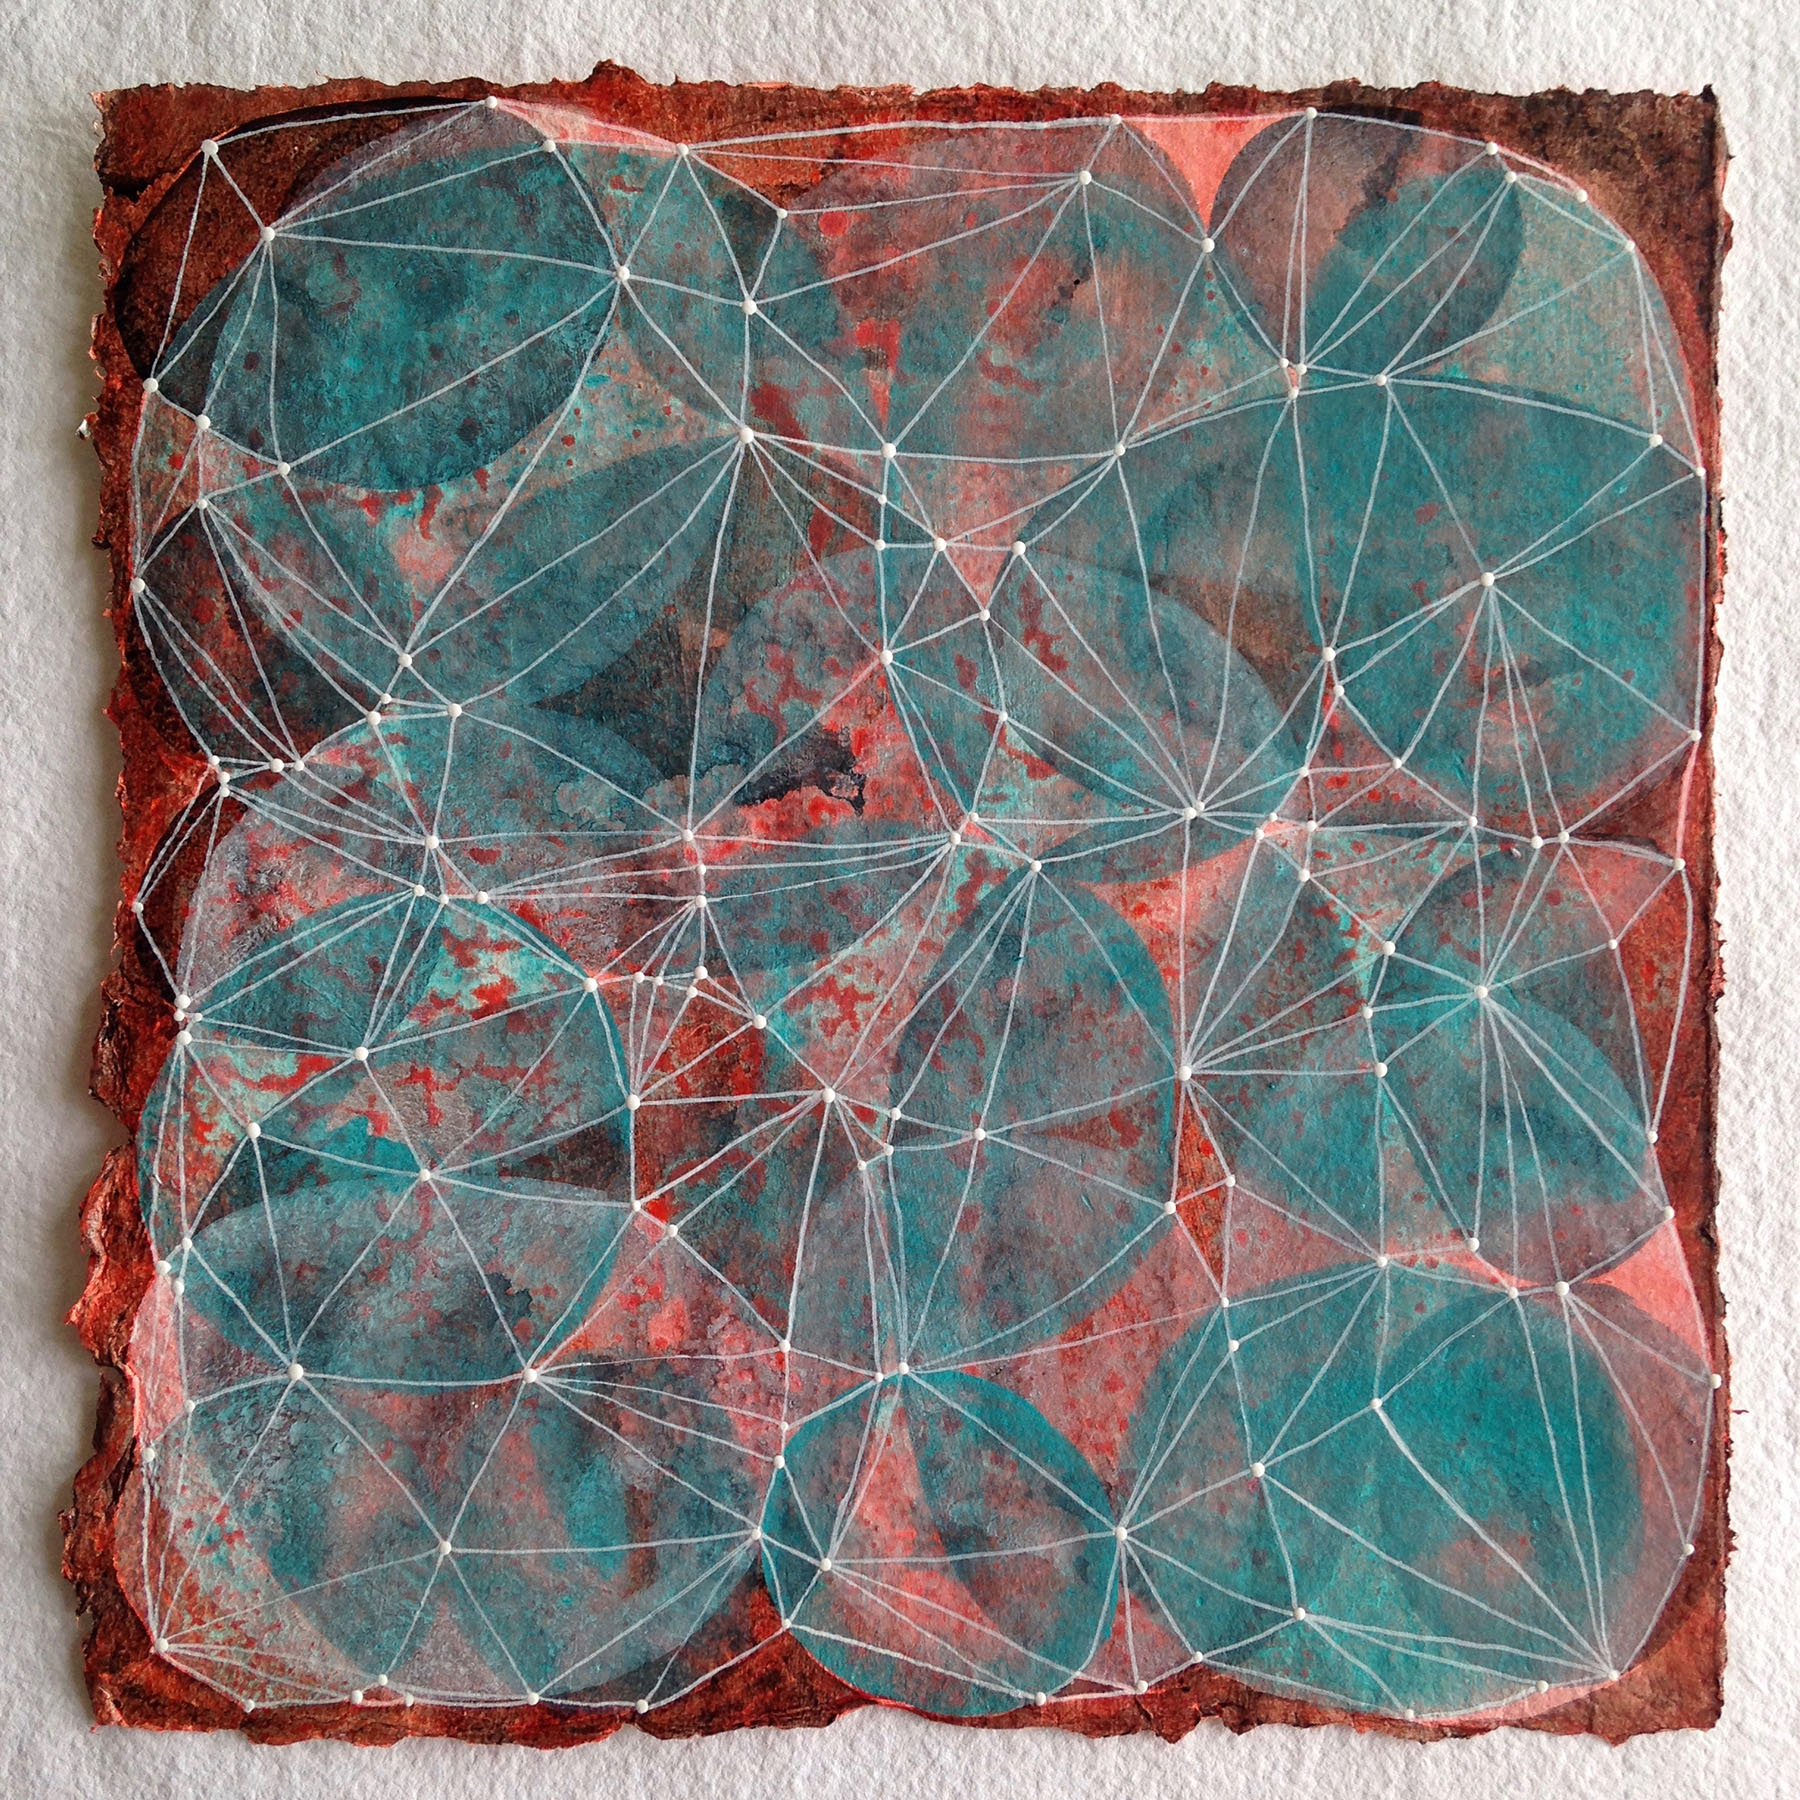 Denise Driscoll,  Inner Garden 11 , Acrylic on paper, 12x12